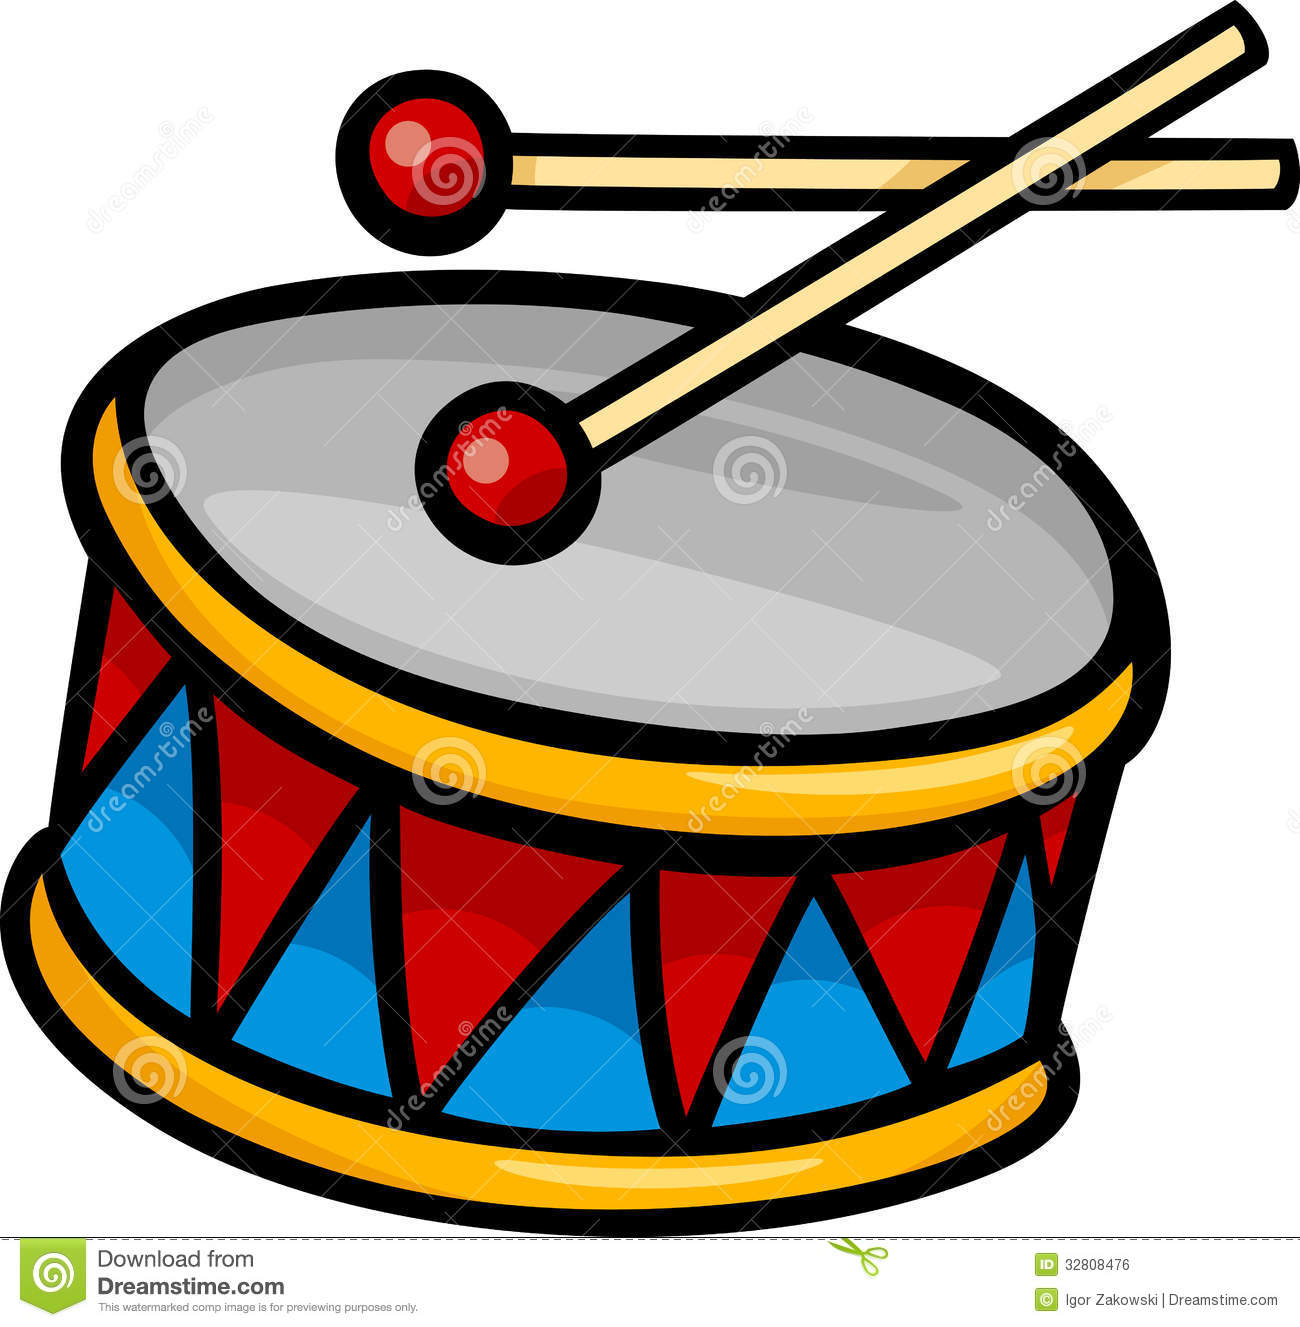 Drums clipart. Snare drum clip art